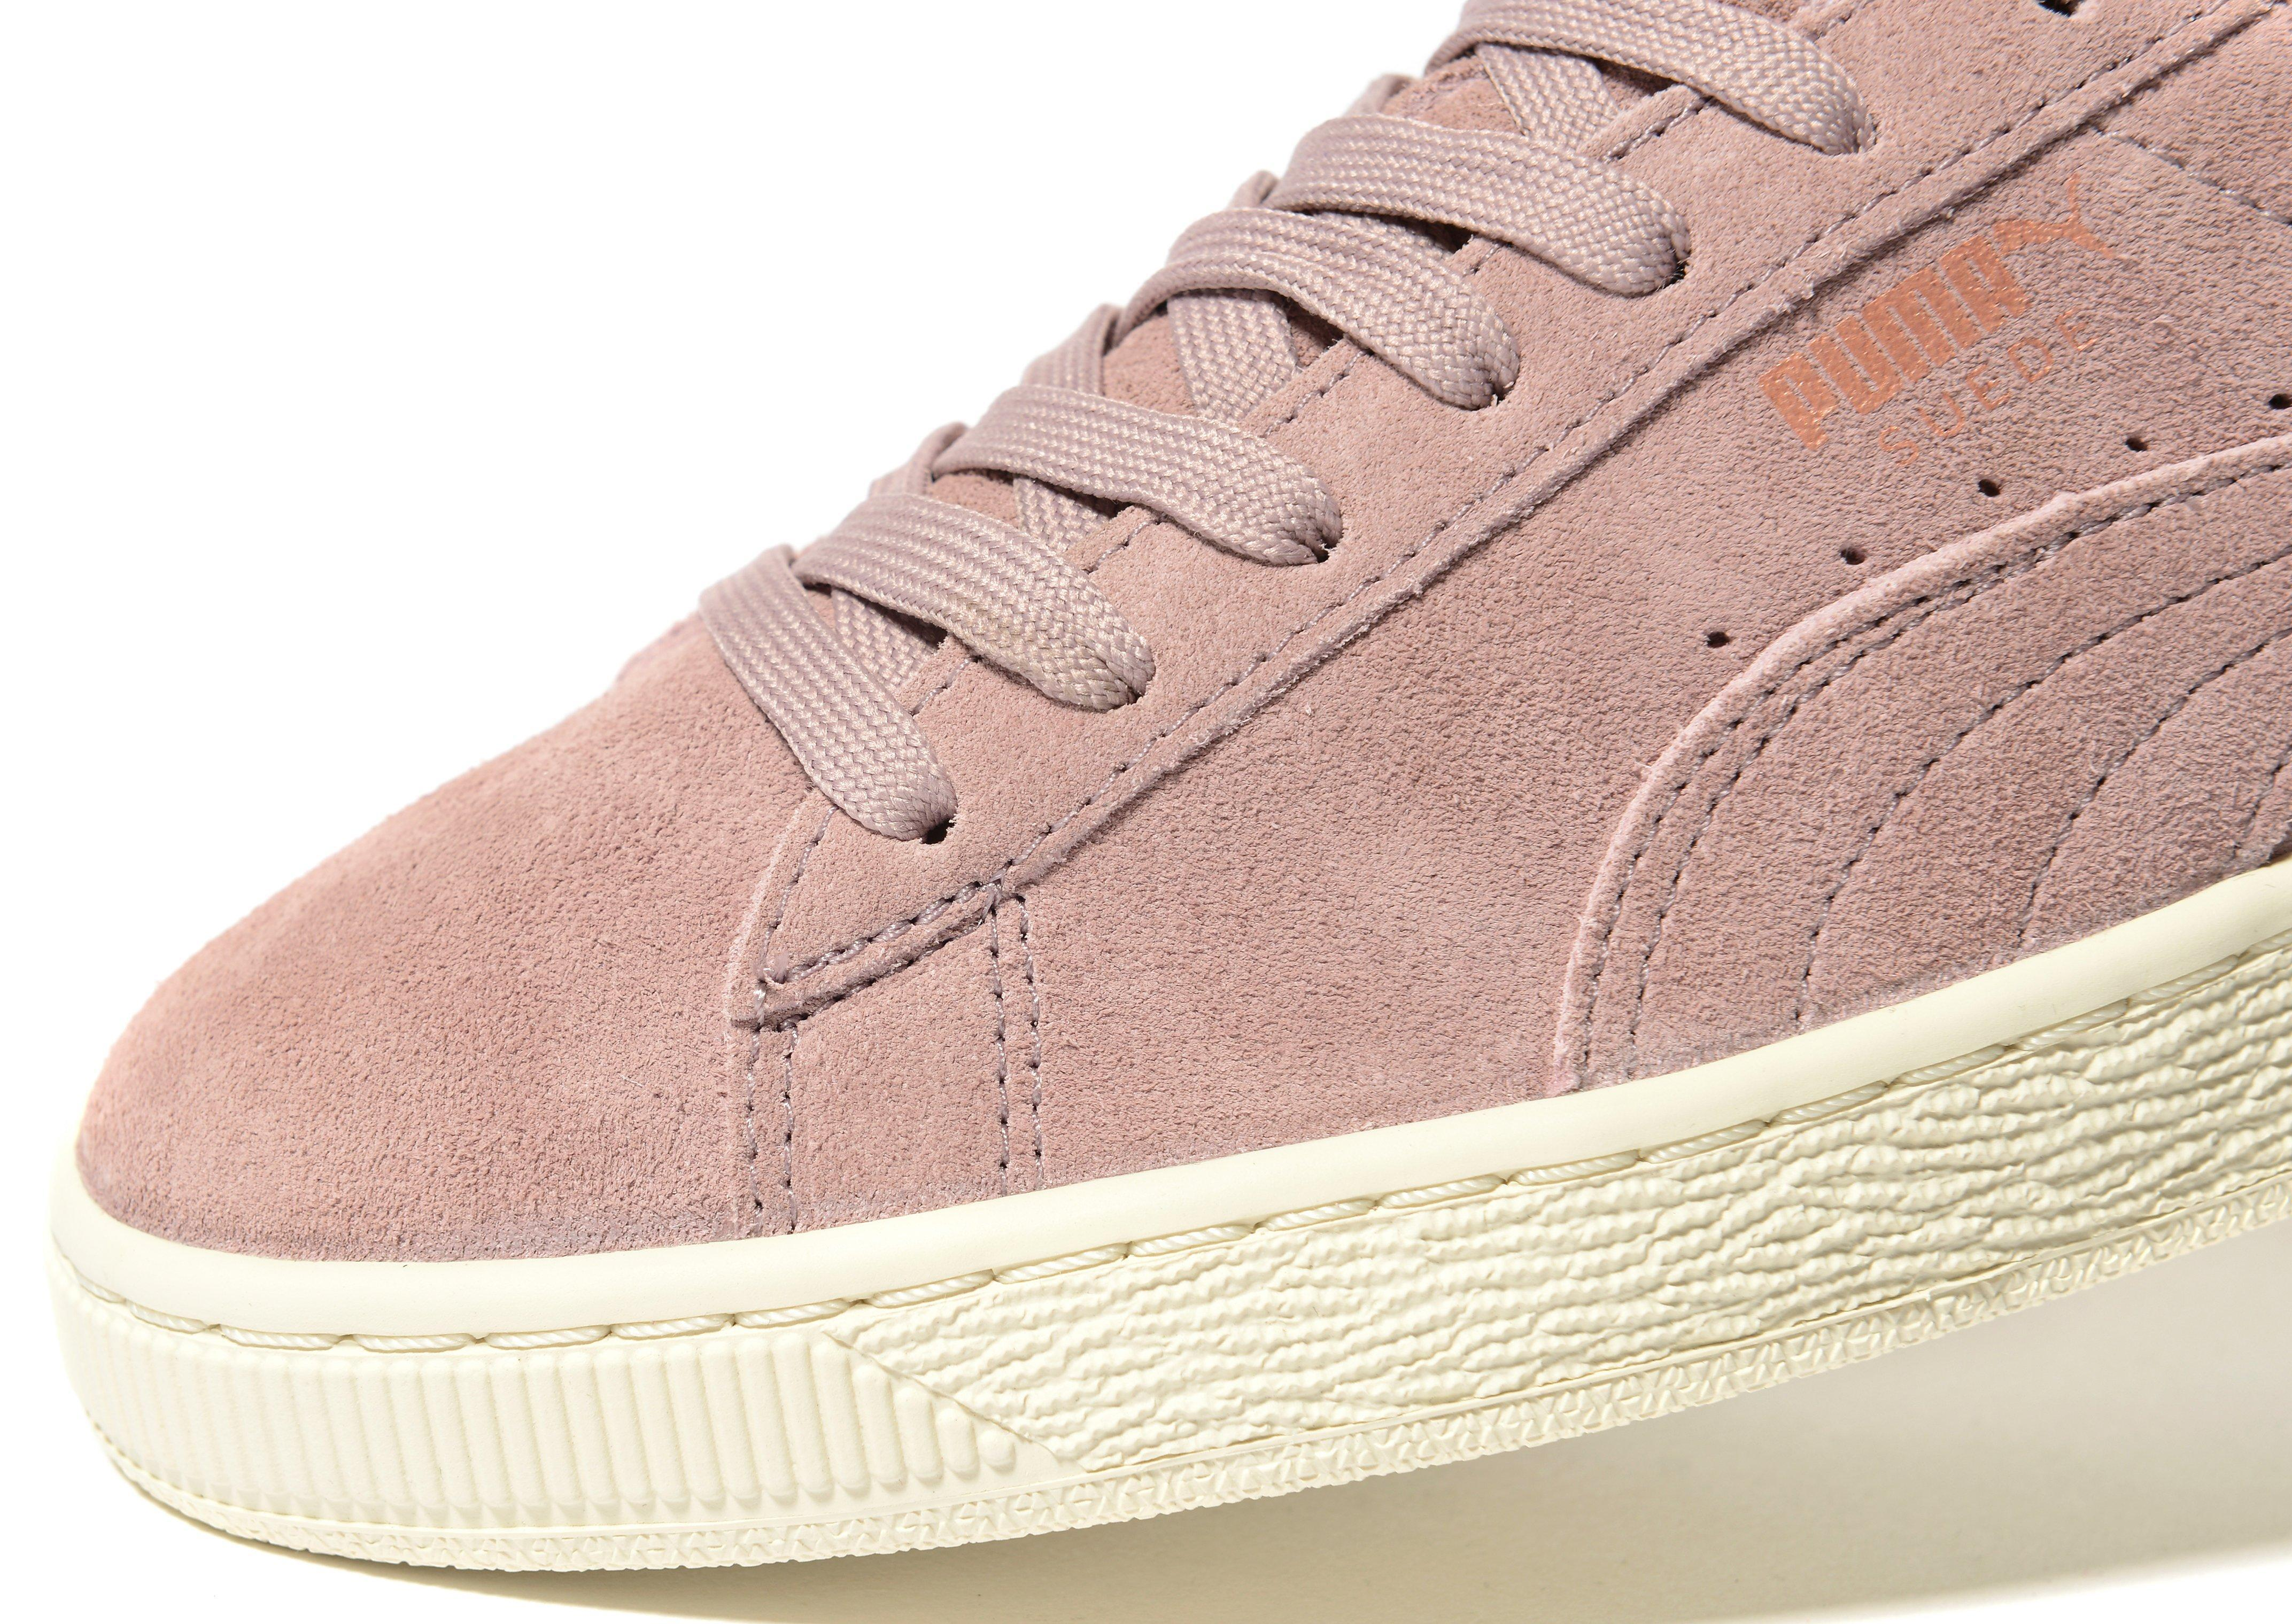 5366409f3b6424 Lyst - Puma Basket Platform Core Trainers in Pink